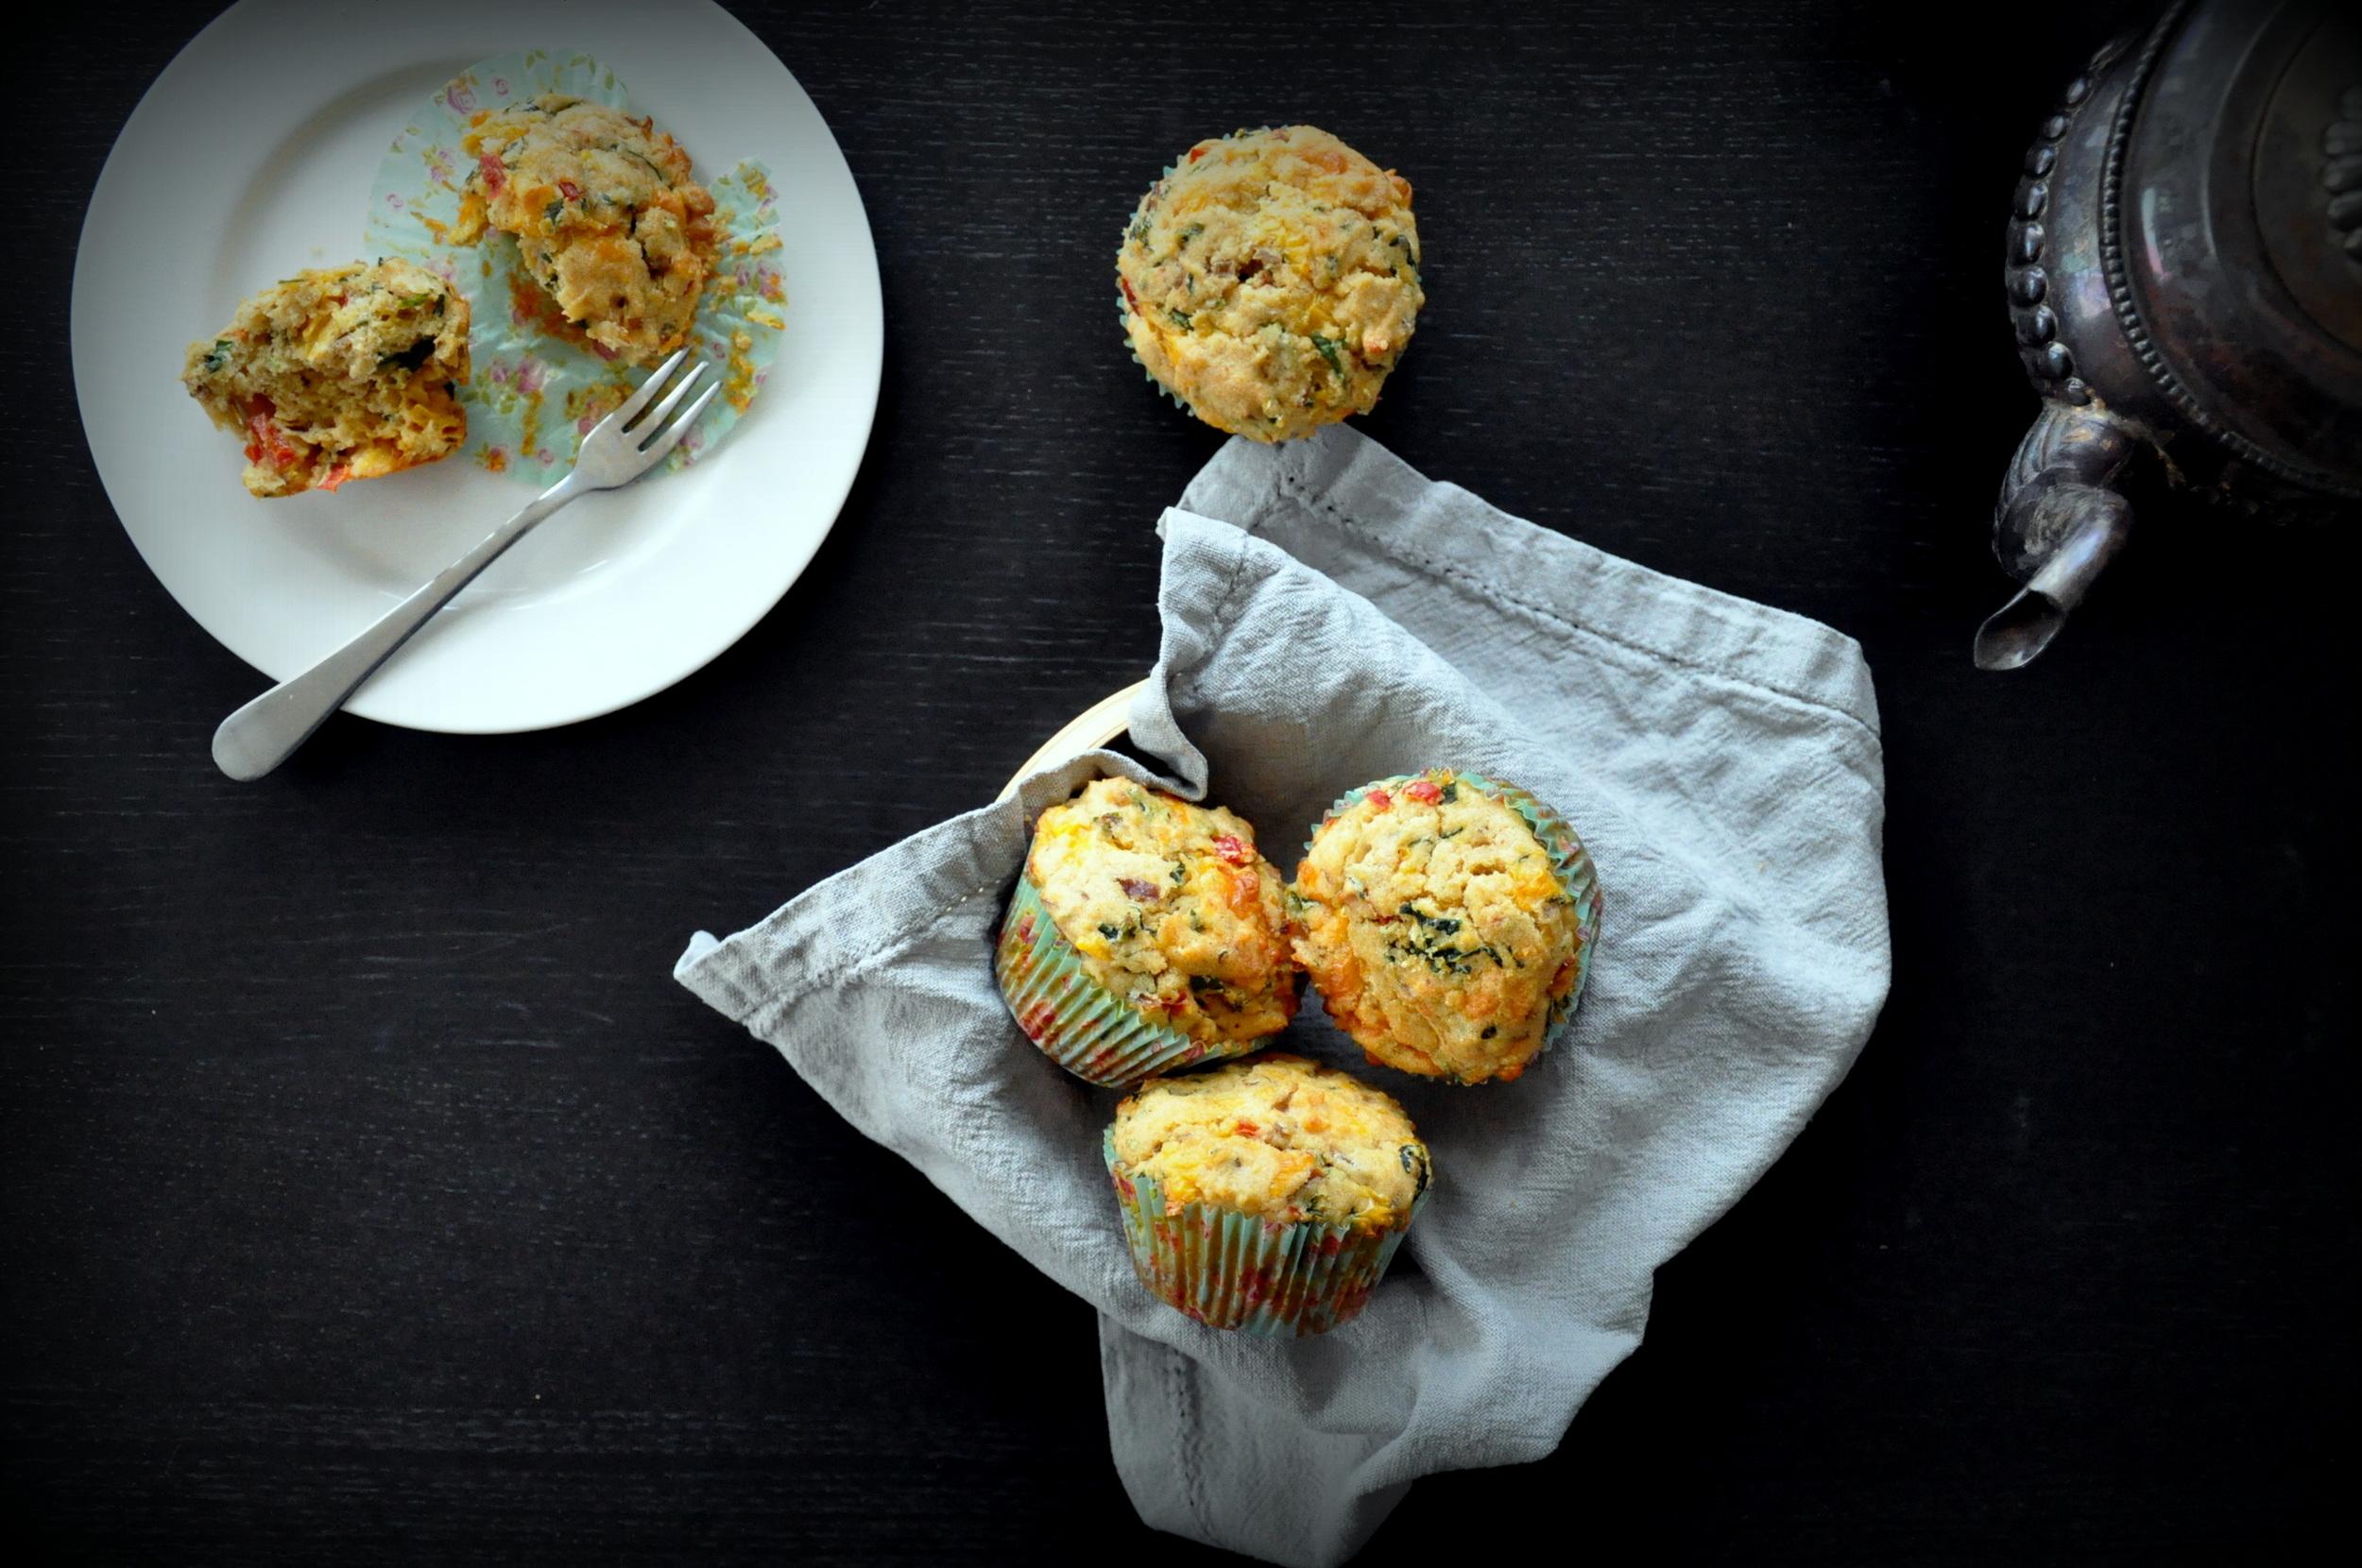 Atta Spicy Savory Muffins7